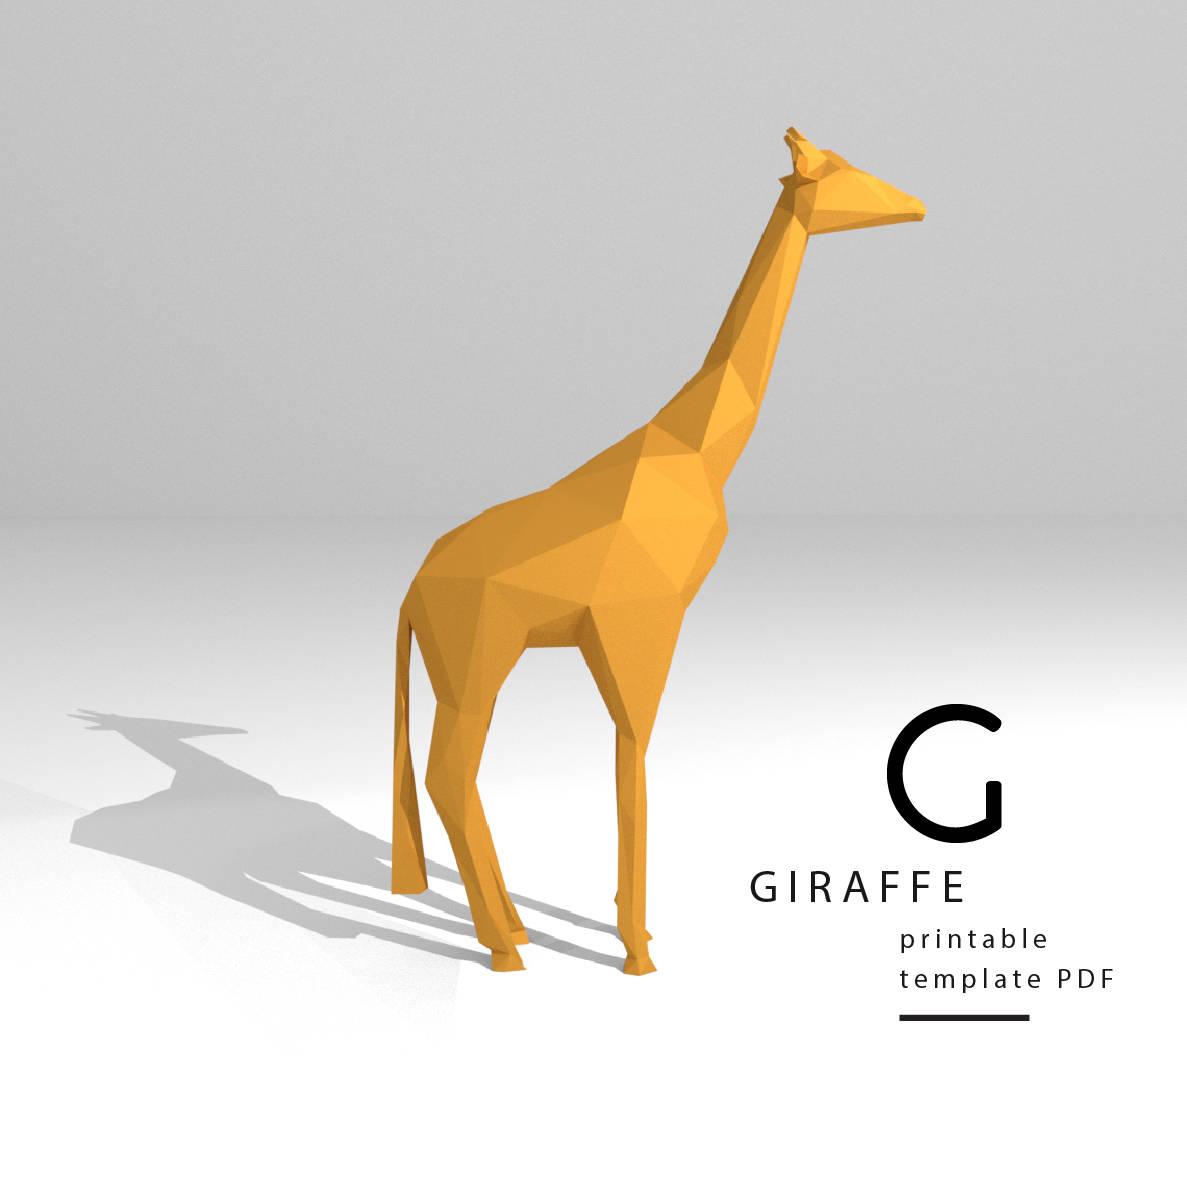 Printable DIY template PDF. Giraffe low poly paper model